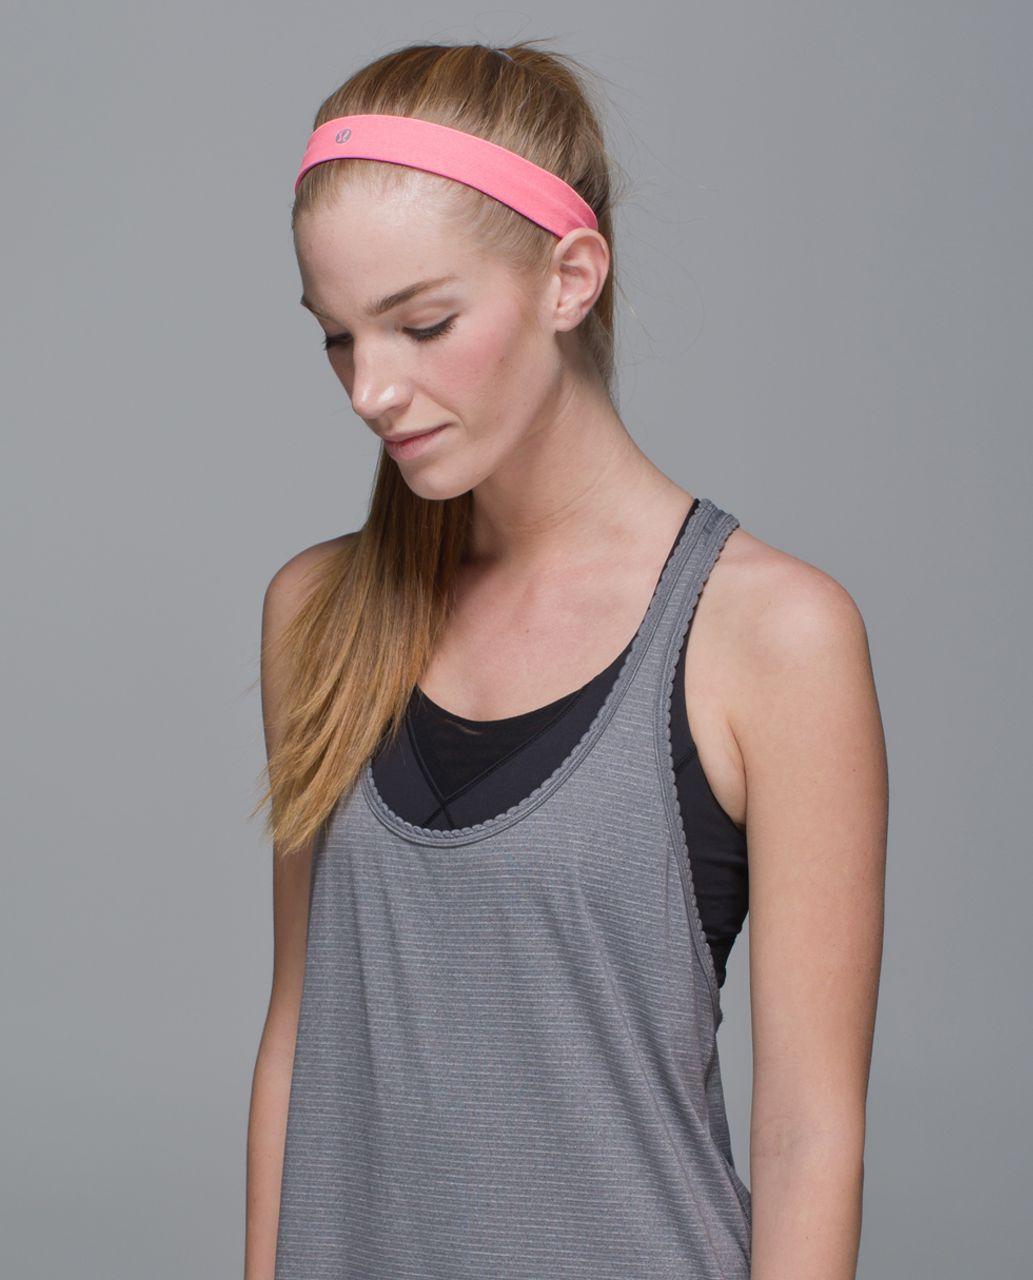 Lululemon Cardio Cross Trainer Headband - Heathered Neon Pink